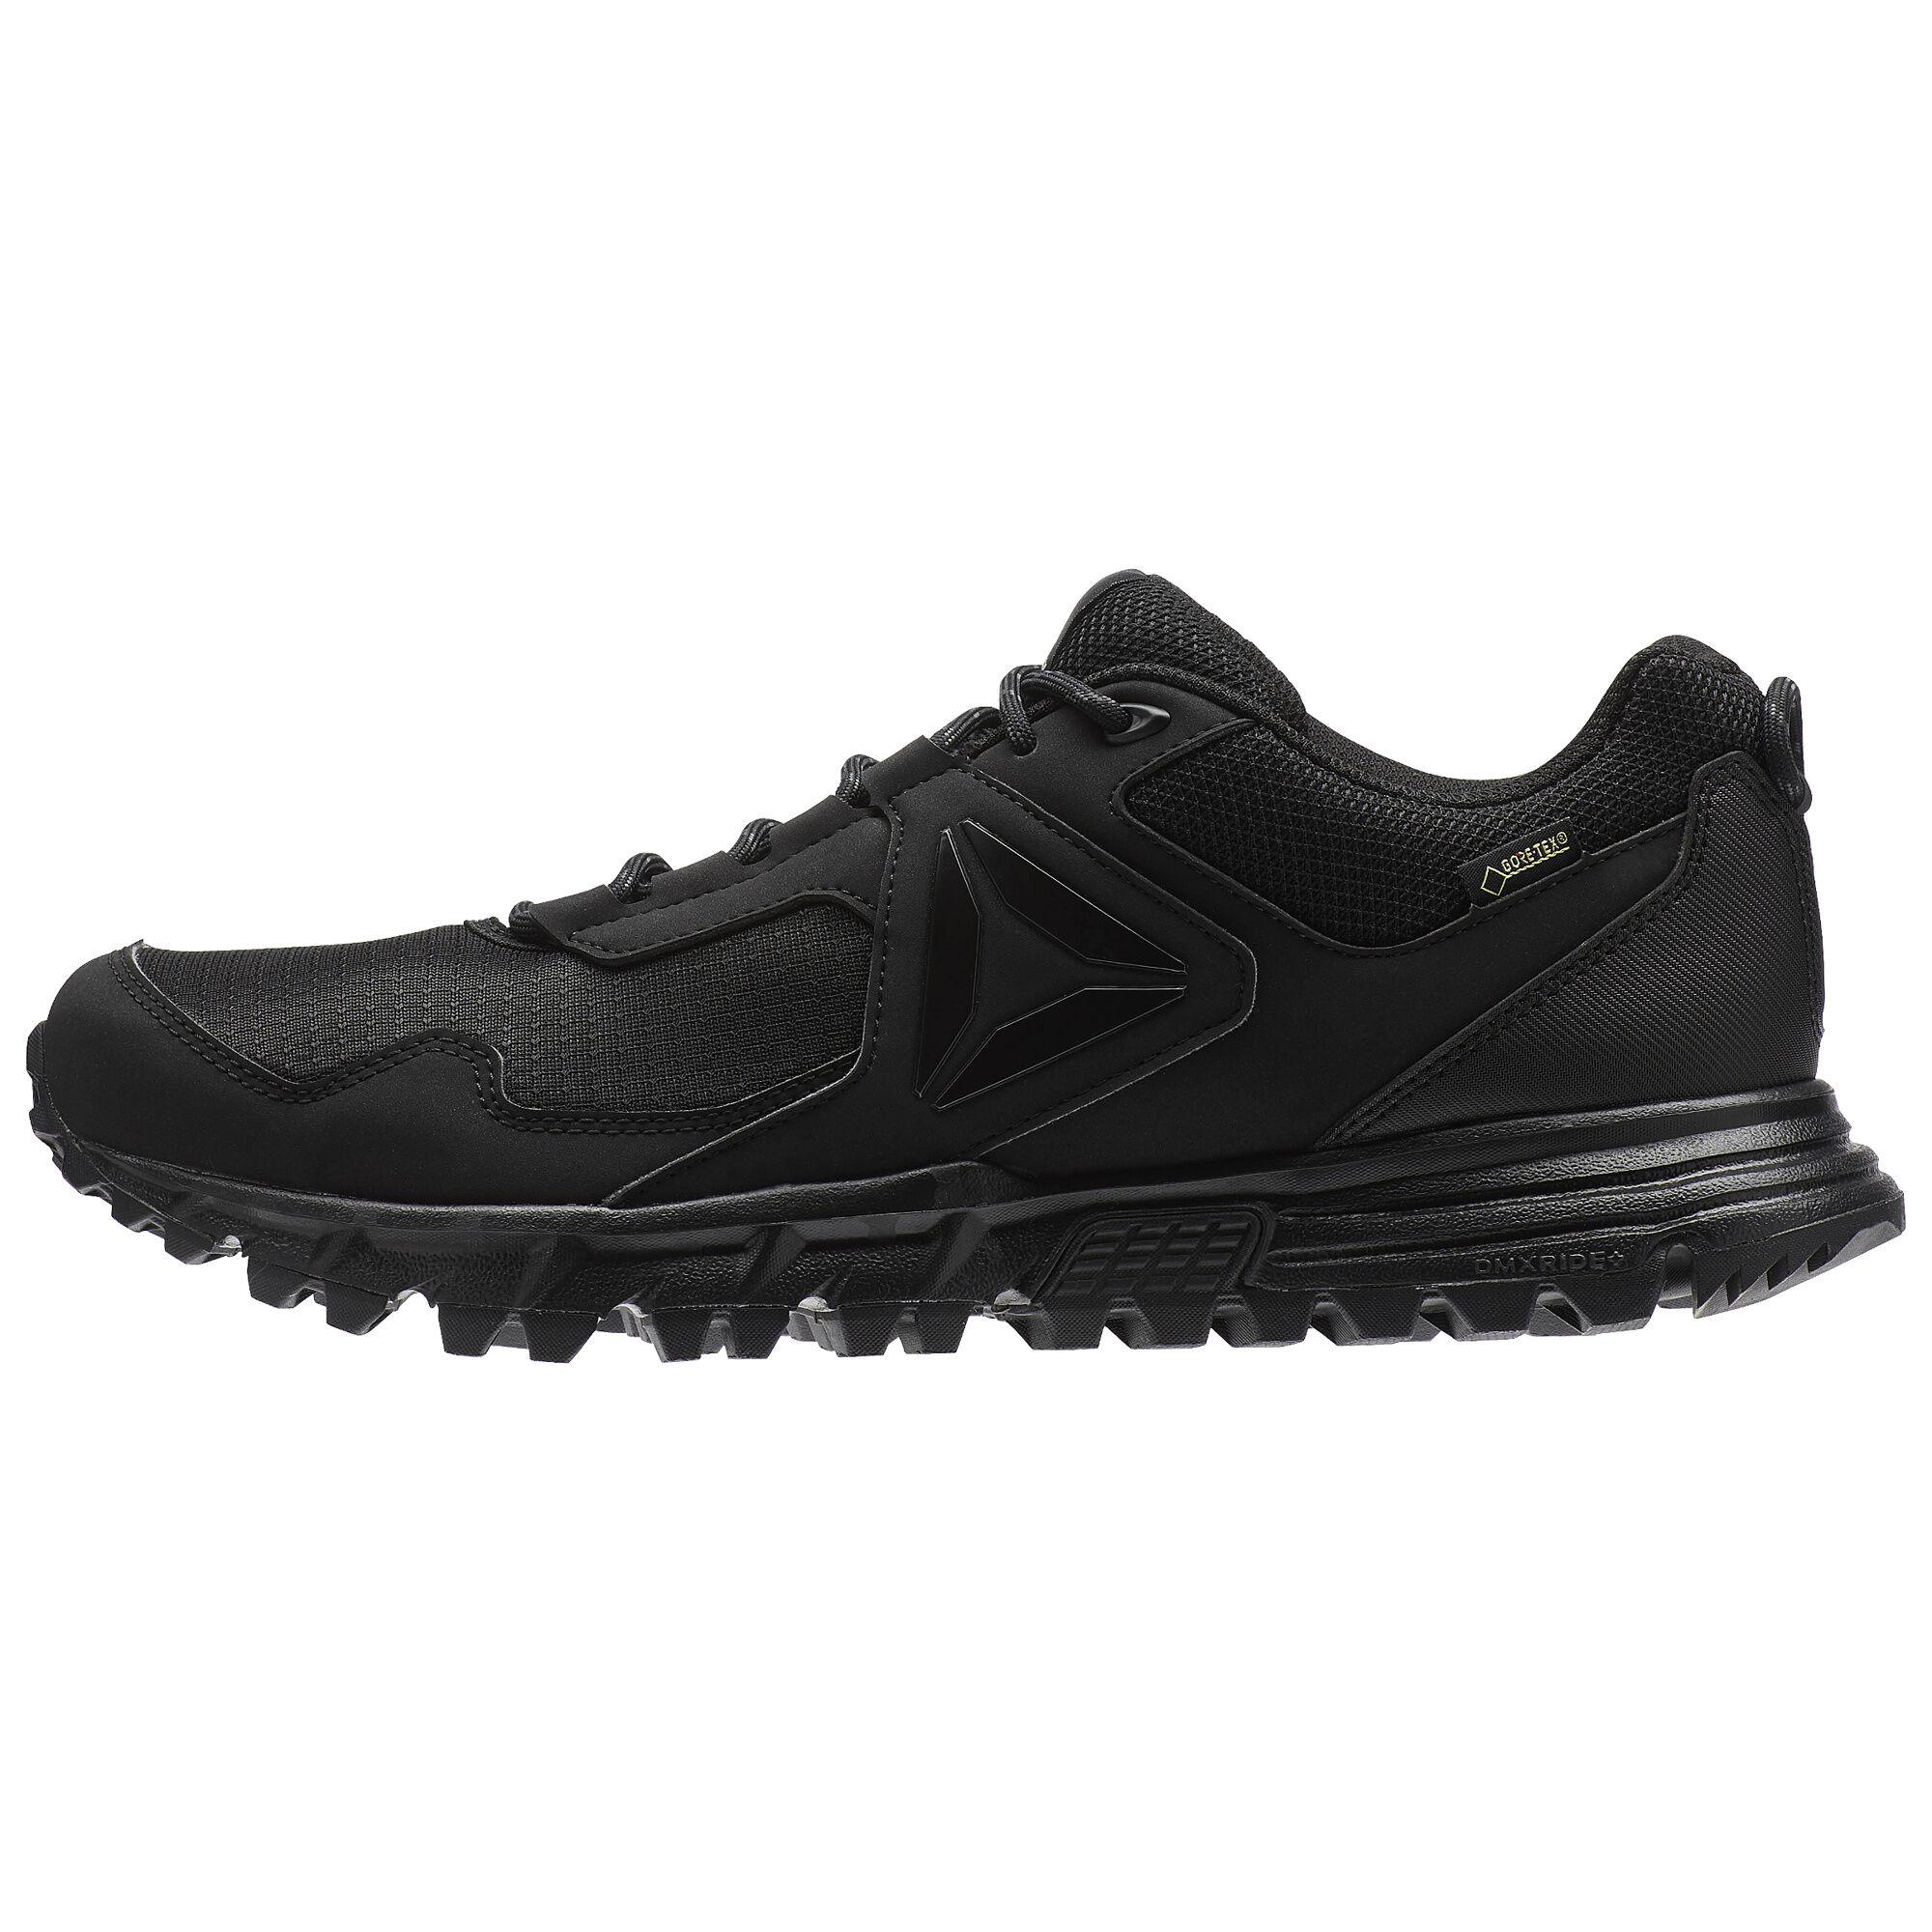 b8031c63bc8ea australia nike free 6.0 bayan spor ayakkab mor beyaz afa5a 4b42b  discount  reebok sawcut 5.0 gtx black reebok mlt e6649 656d2